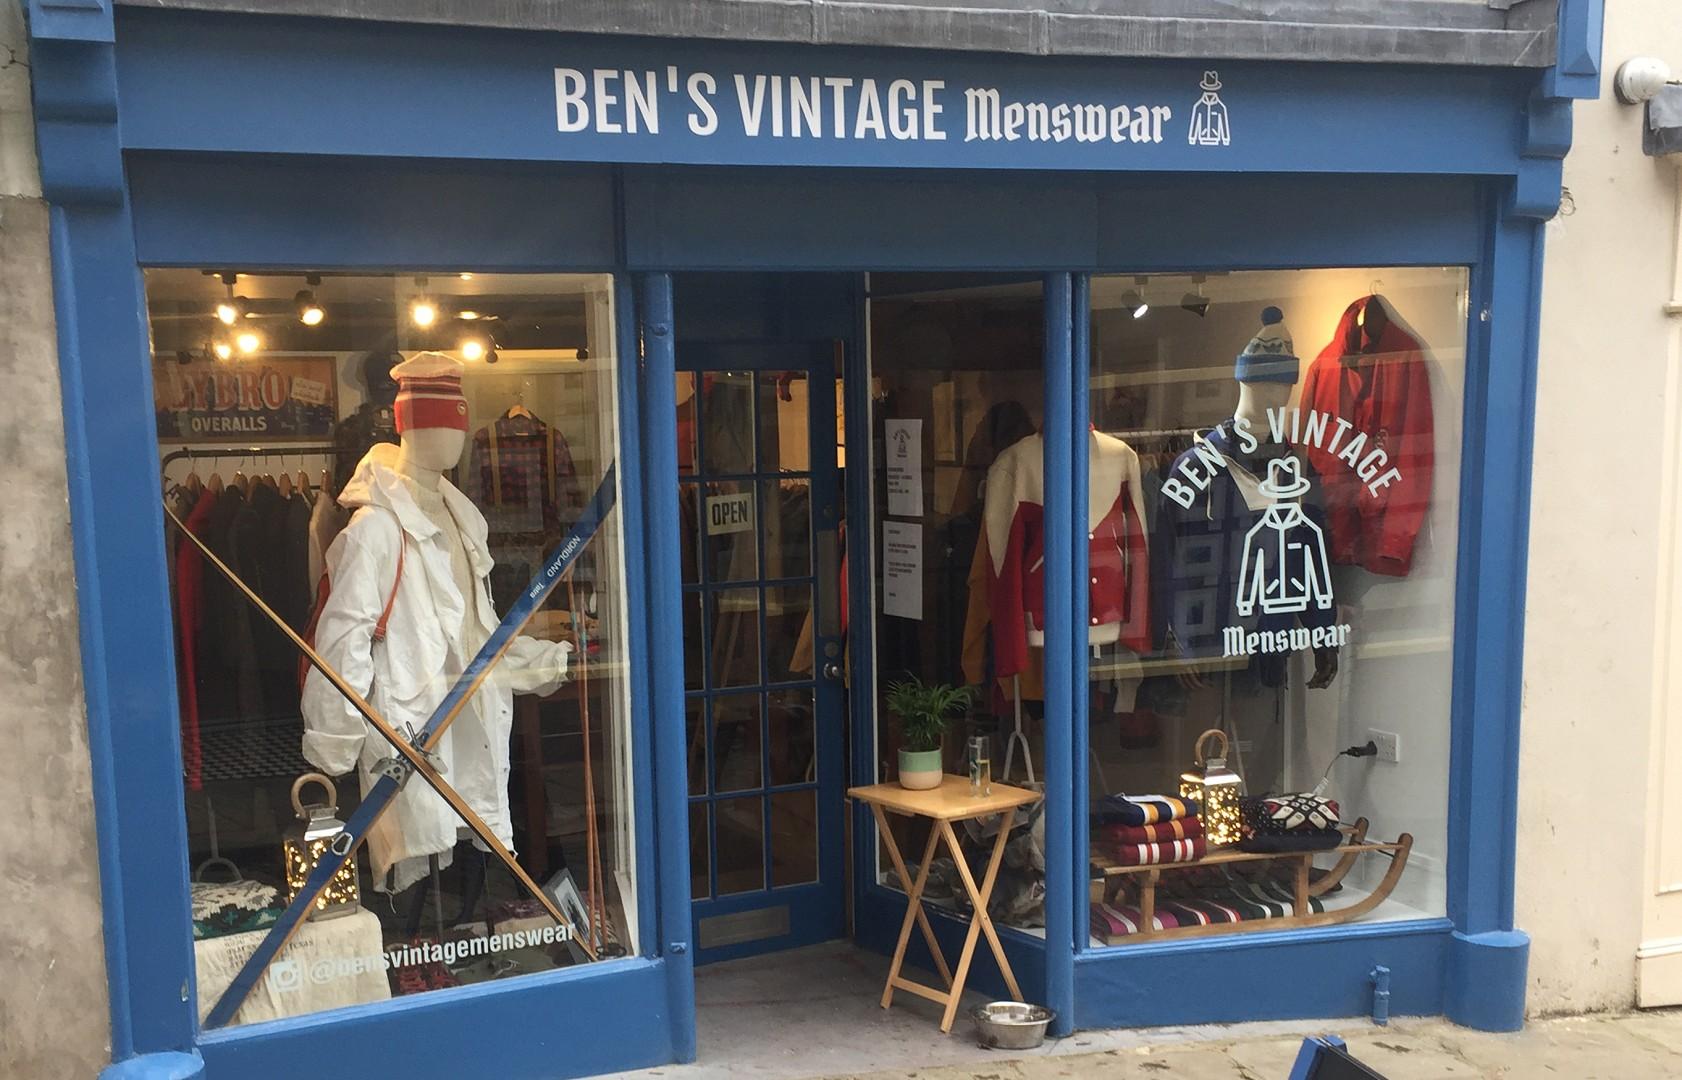 Bens Vintage Menswear shop front